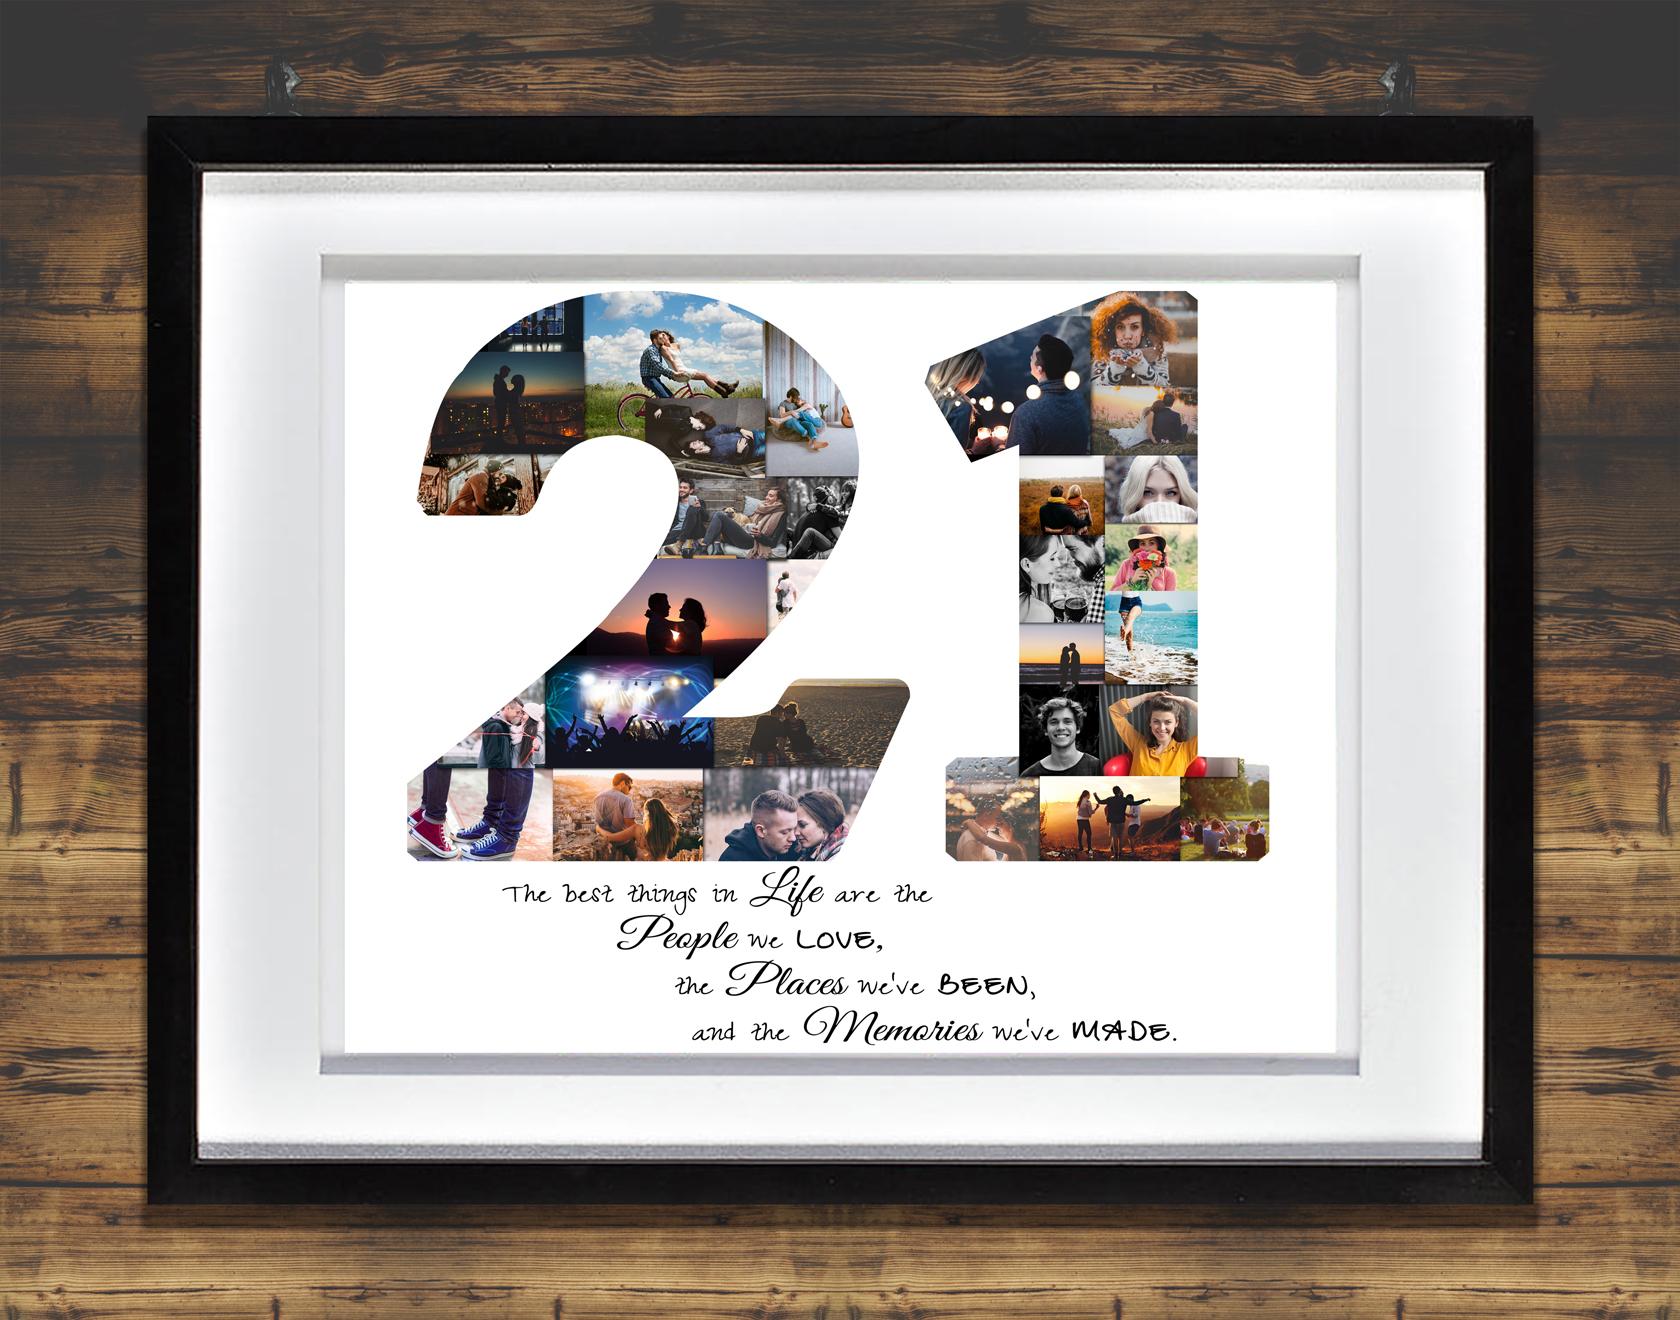 21st Birthday Photo Collage Premium Hand Crafted Collage Artsy